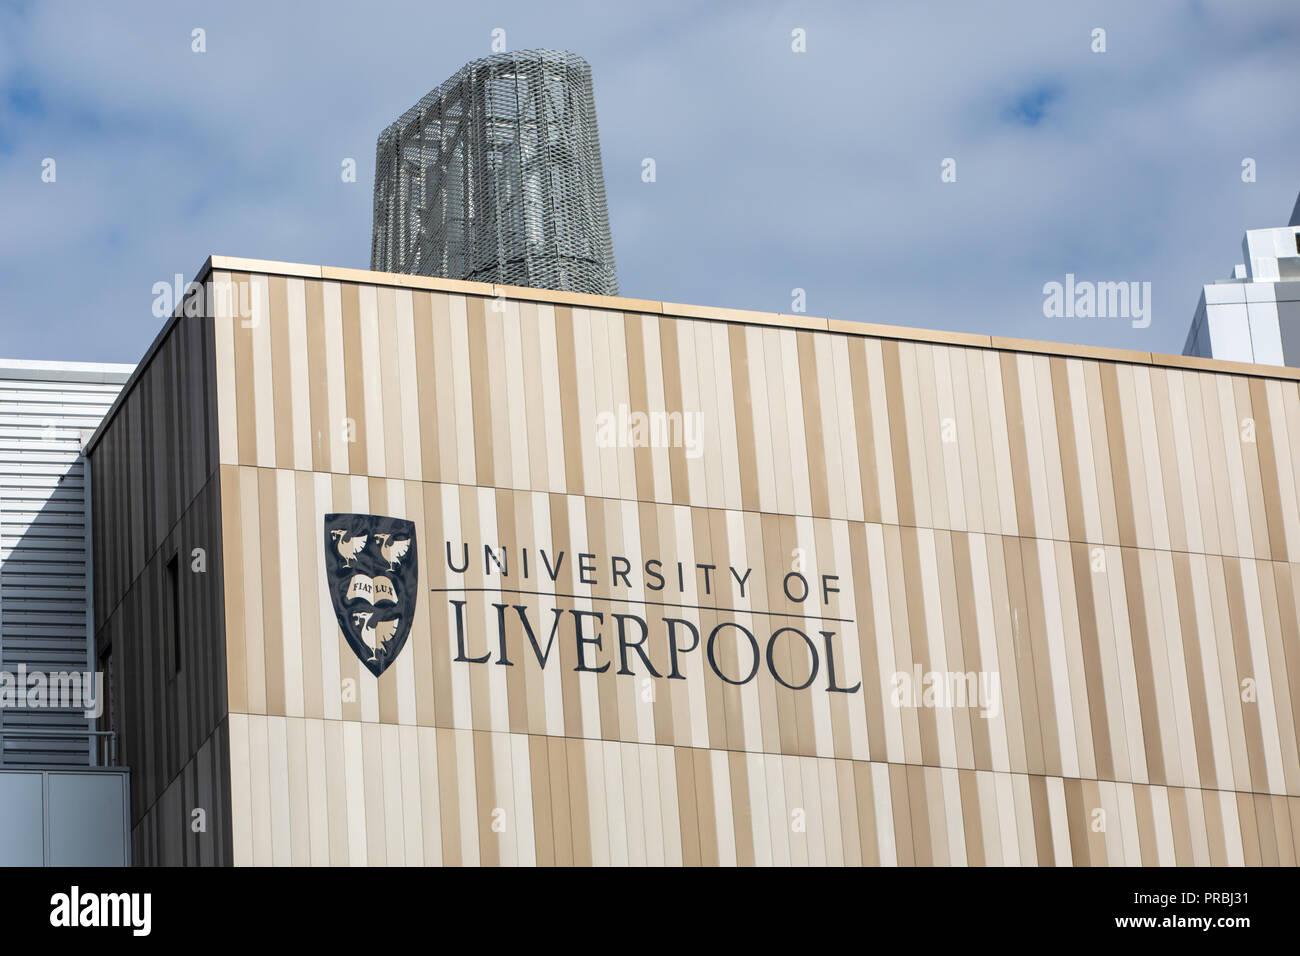 Liverpool University - Stock Image